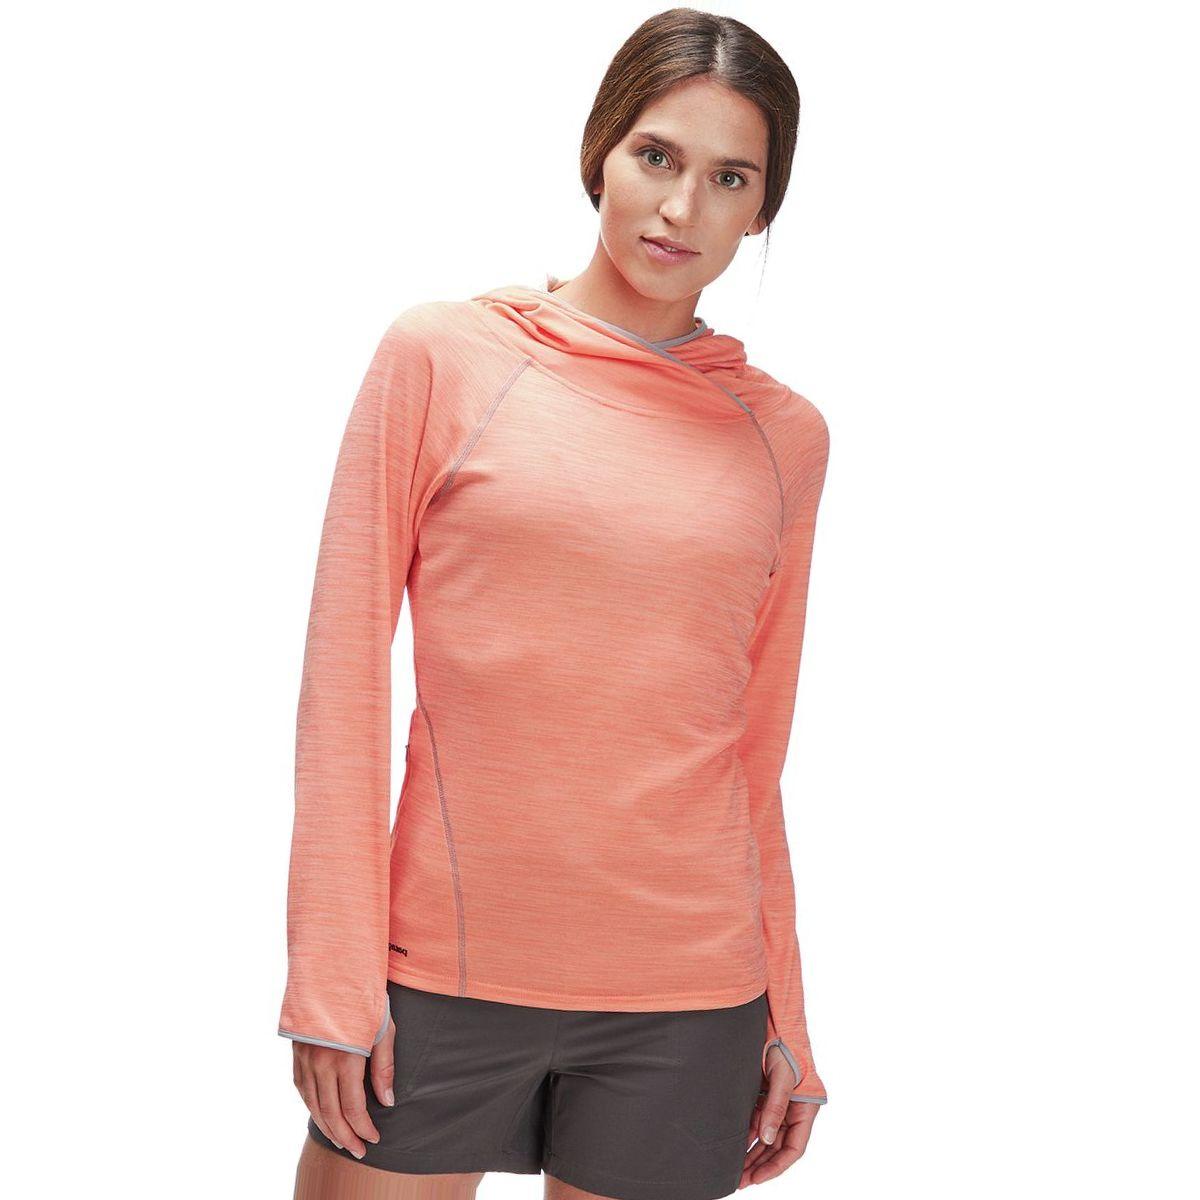 Patagonia Sunshade Hooded Shirt - Women's